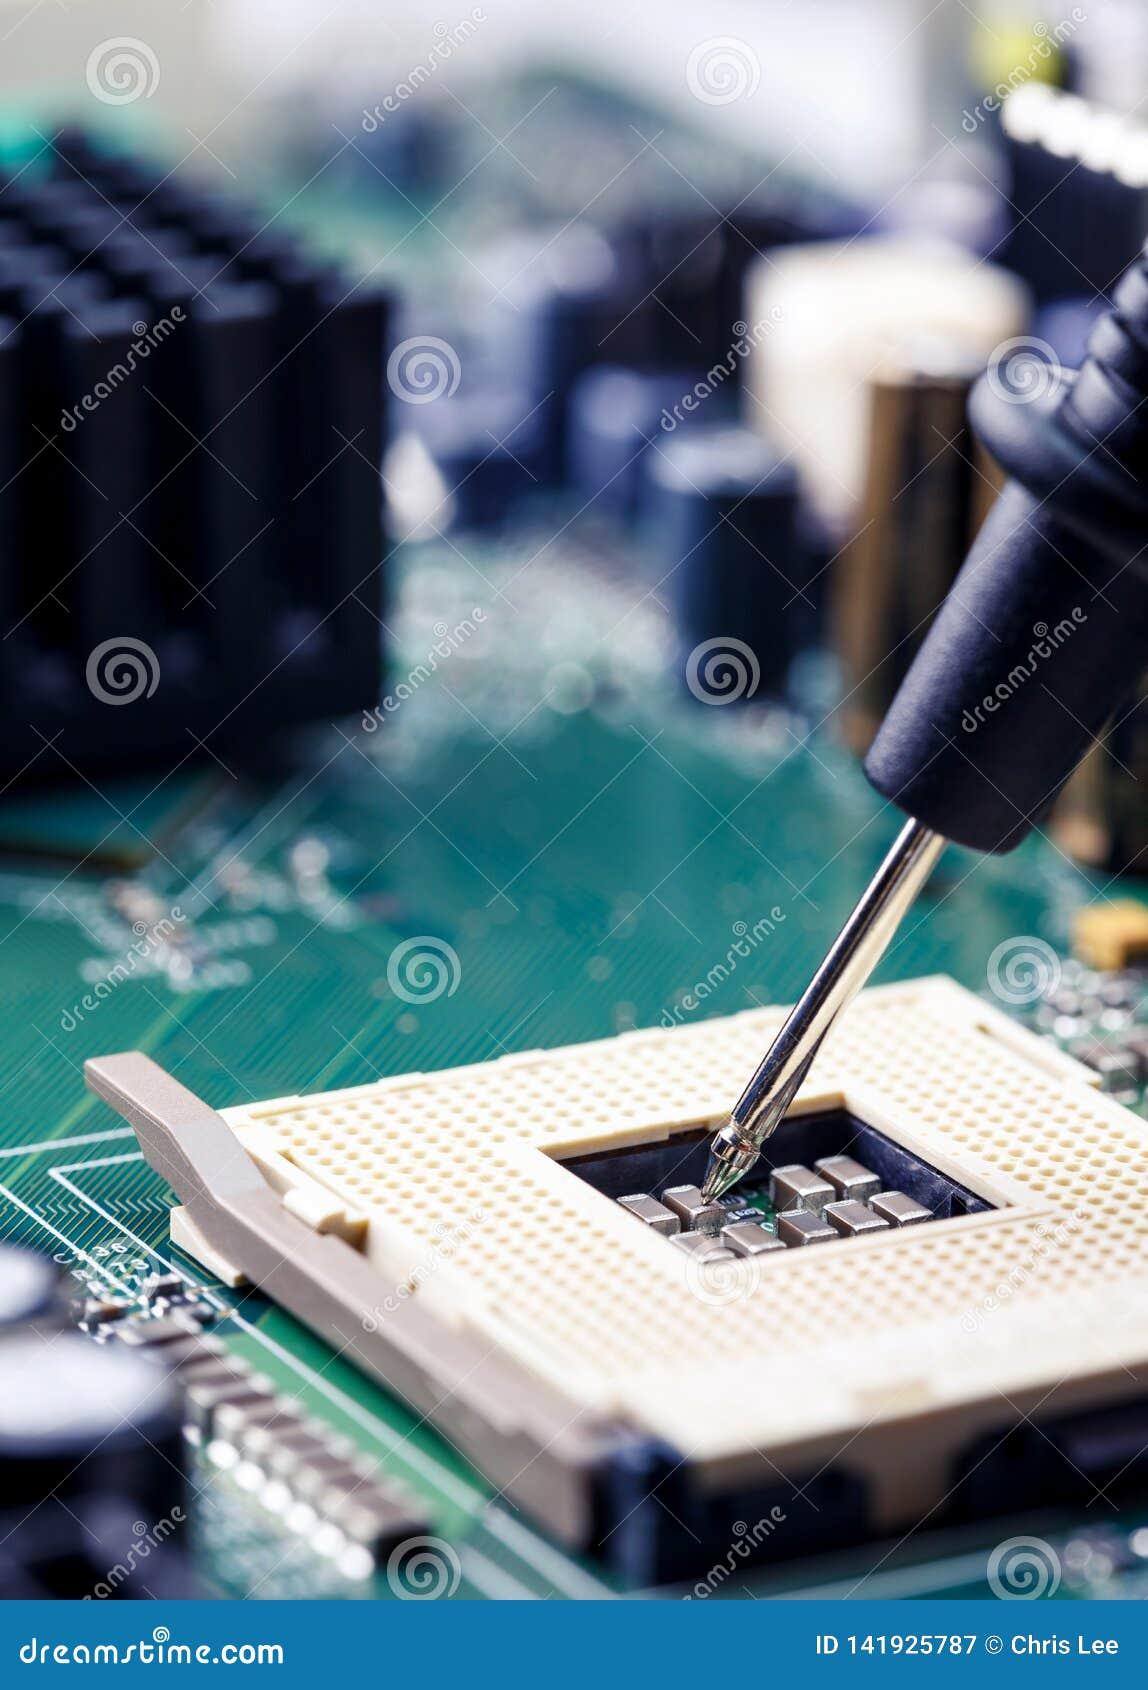 Close Up - Technician engineer measuring multimeter CPU socket computer motherboard